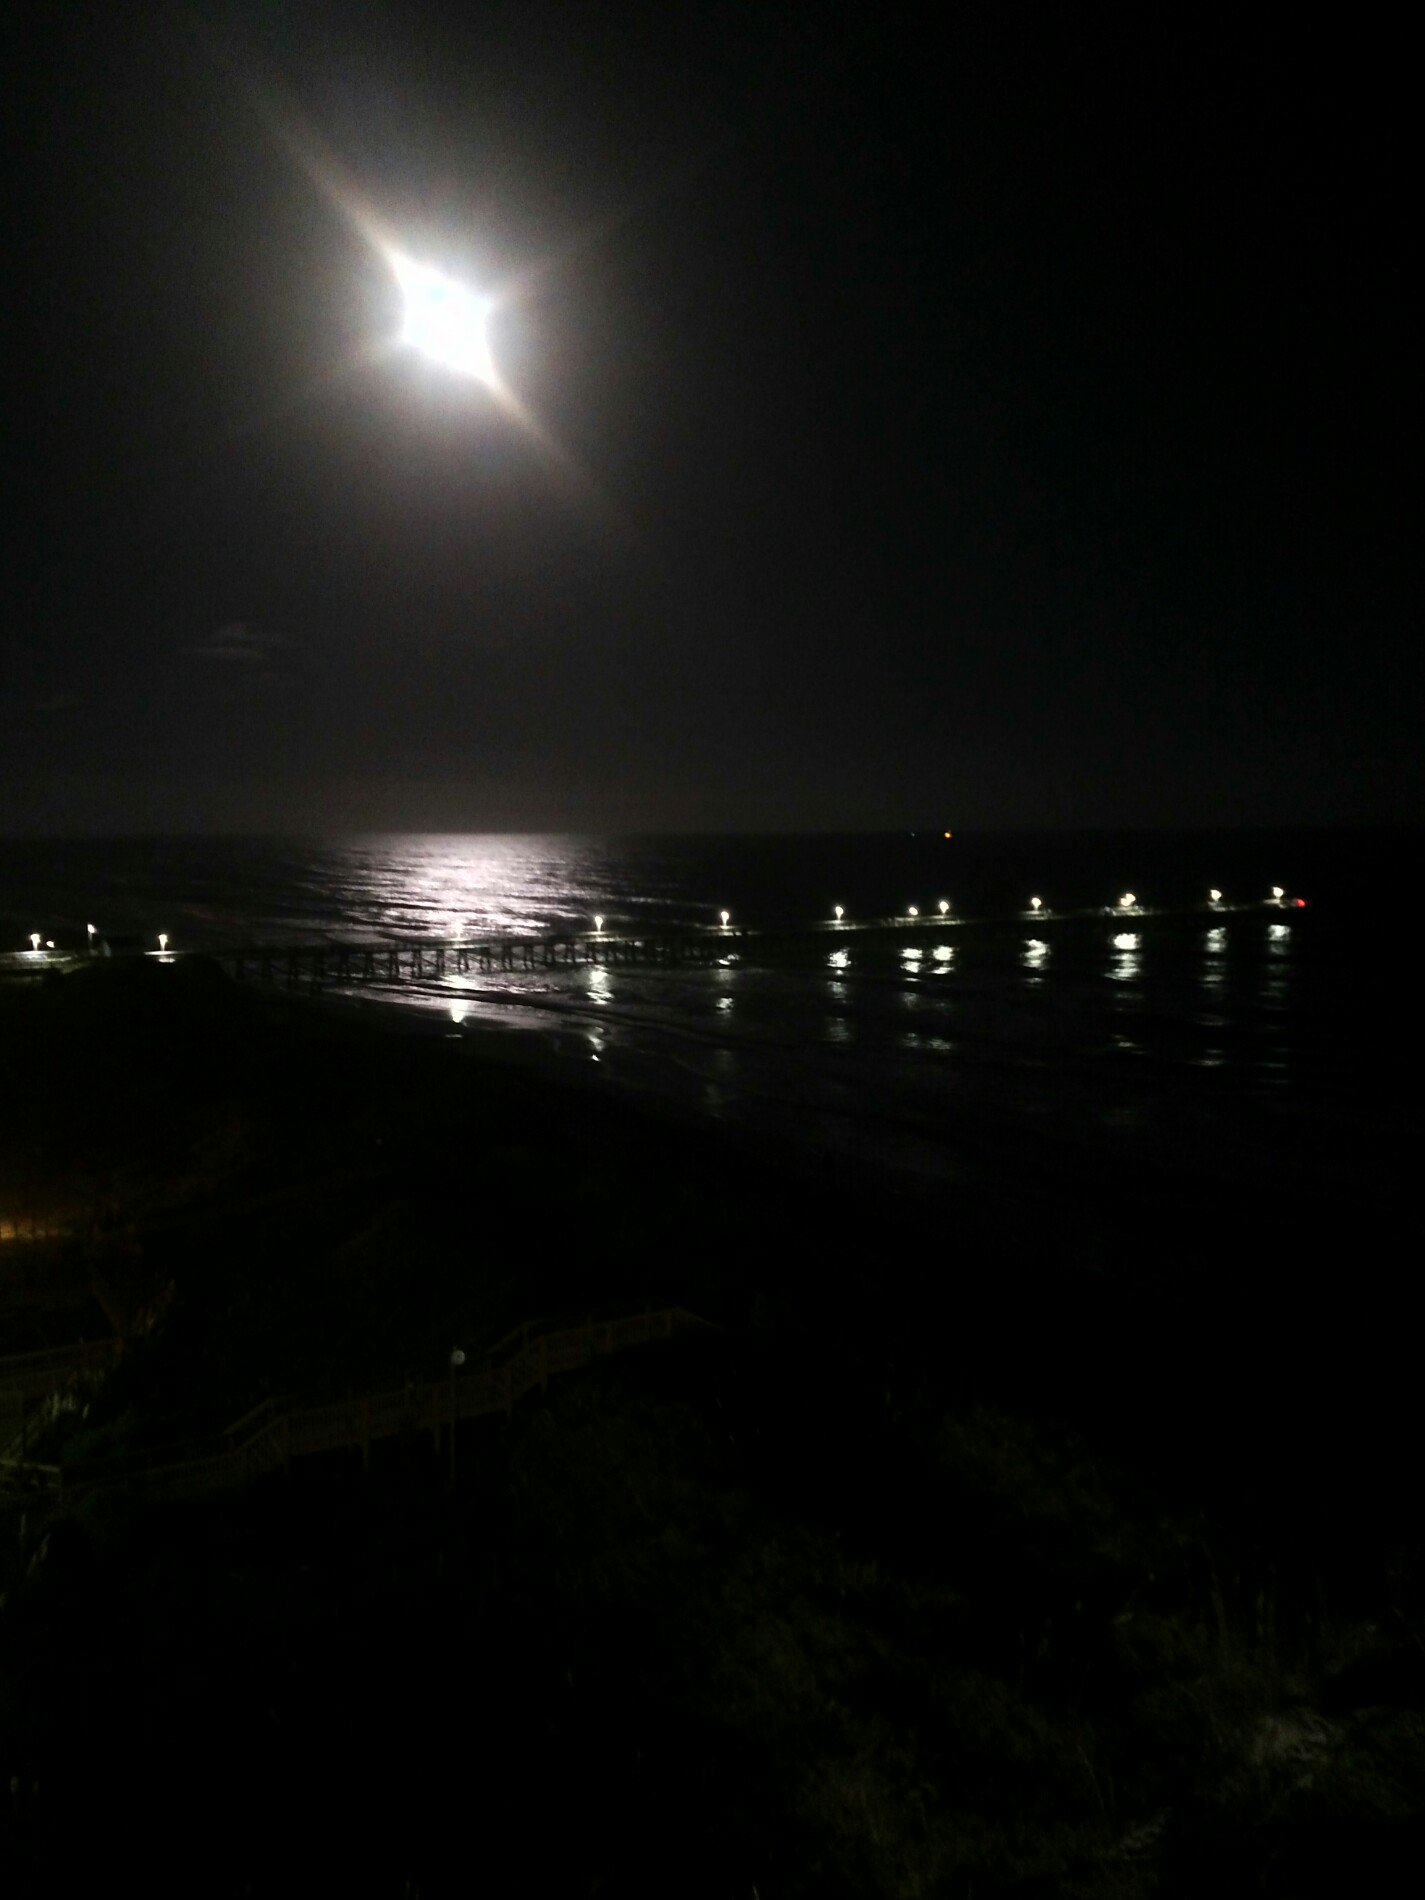 I'm at Xanadu II in North Myrtle Beach, SC https://t.co/C3lB96C0GJ https://t.co/TJlkmPBhuQ